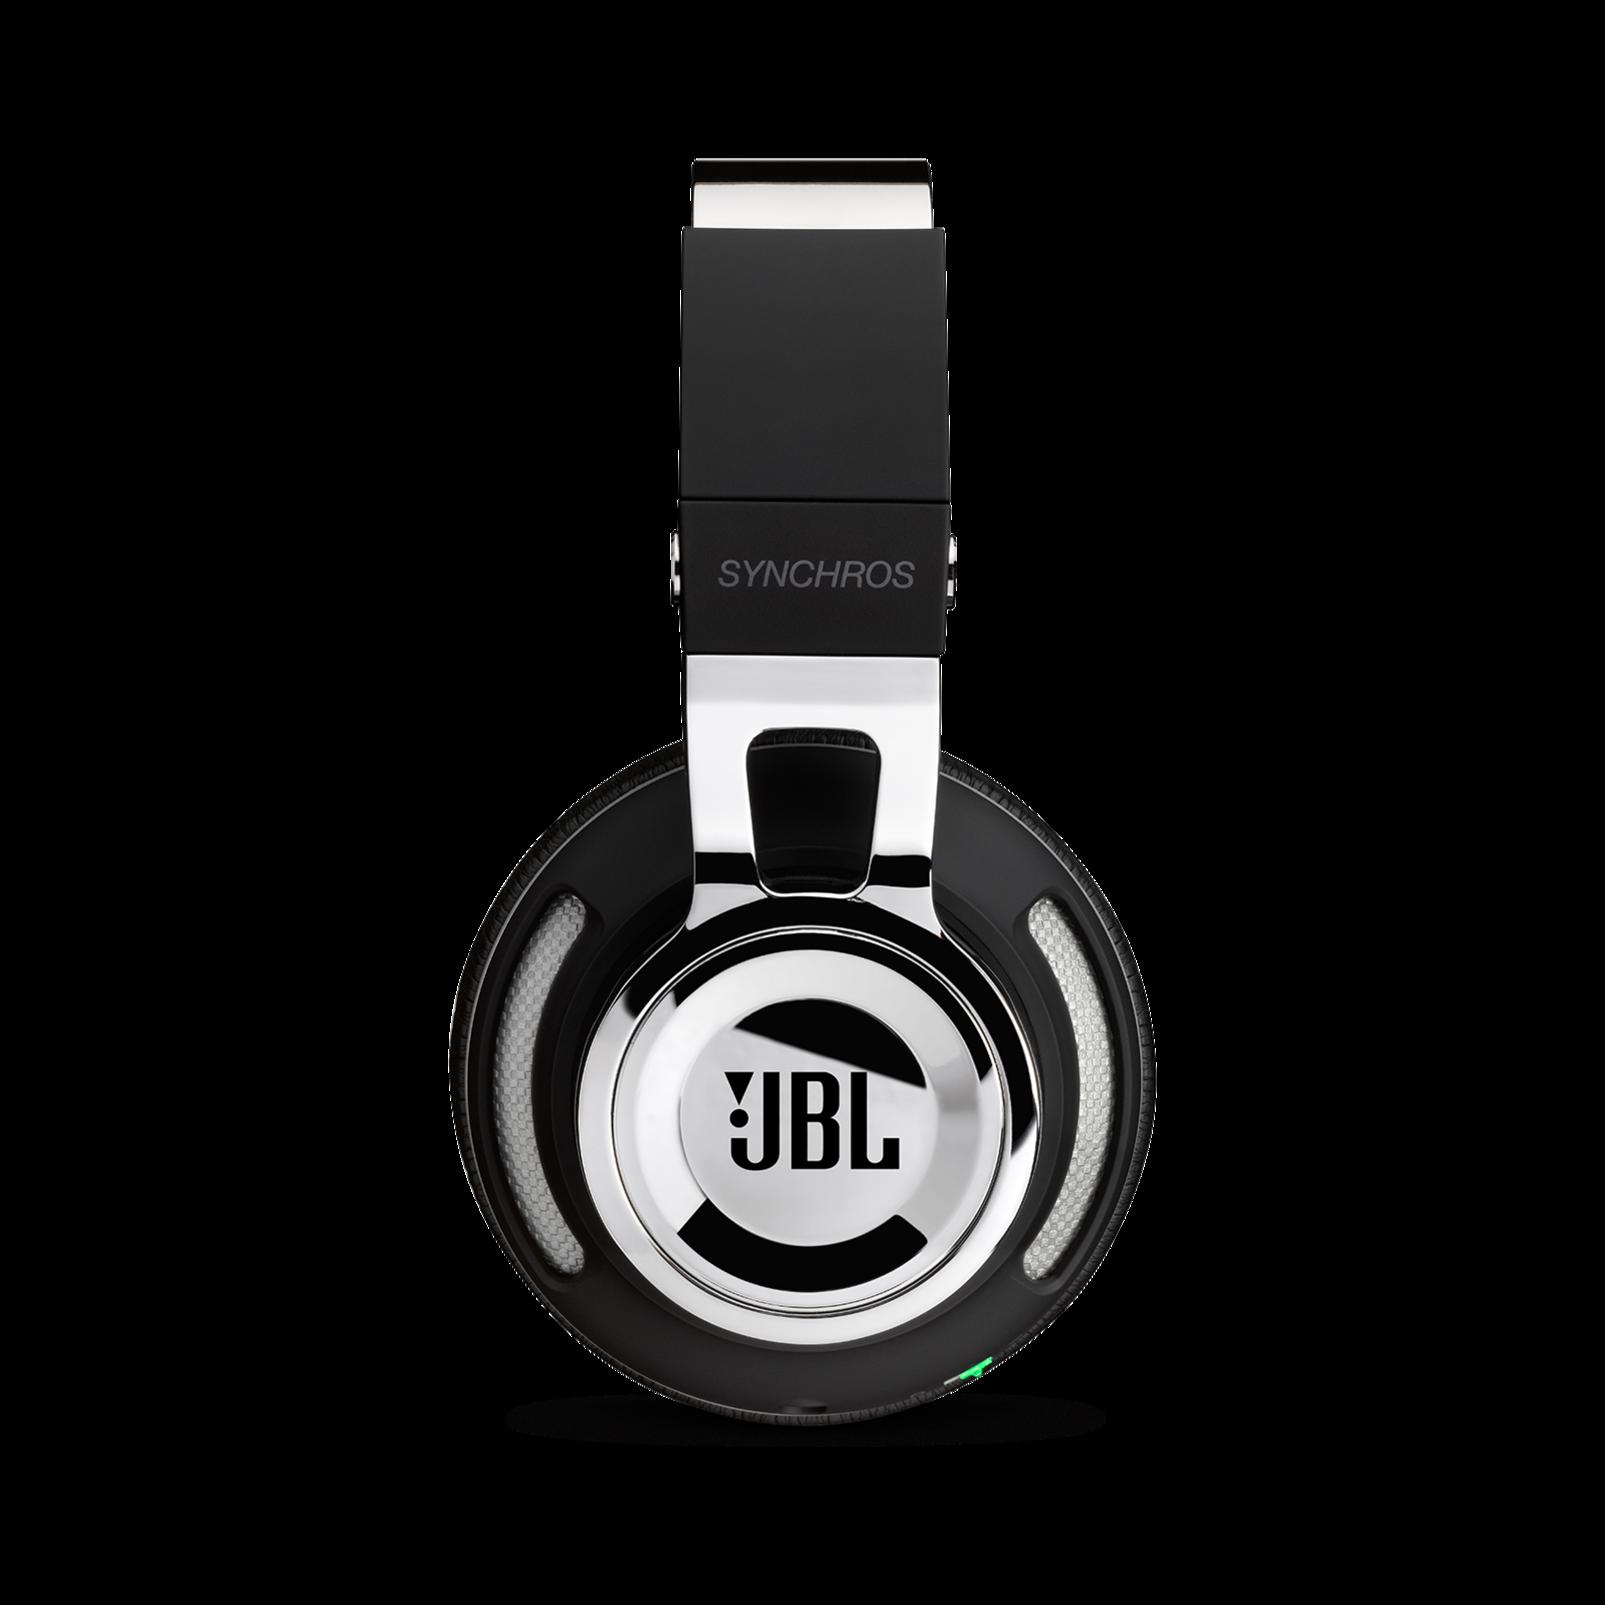 JBL Synchros Chrome Edition, Powered Over-Ear Headphones $99 + Free Shipping!